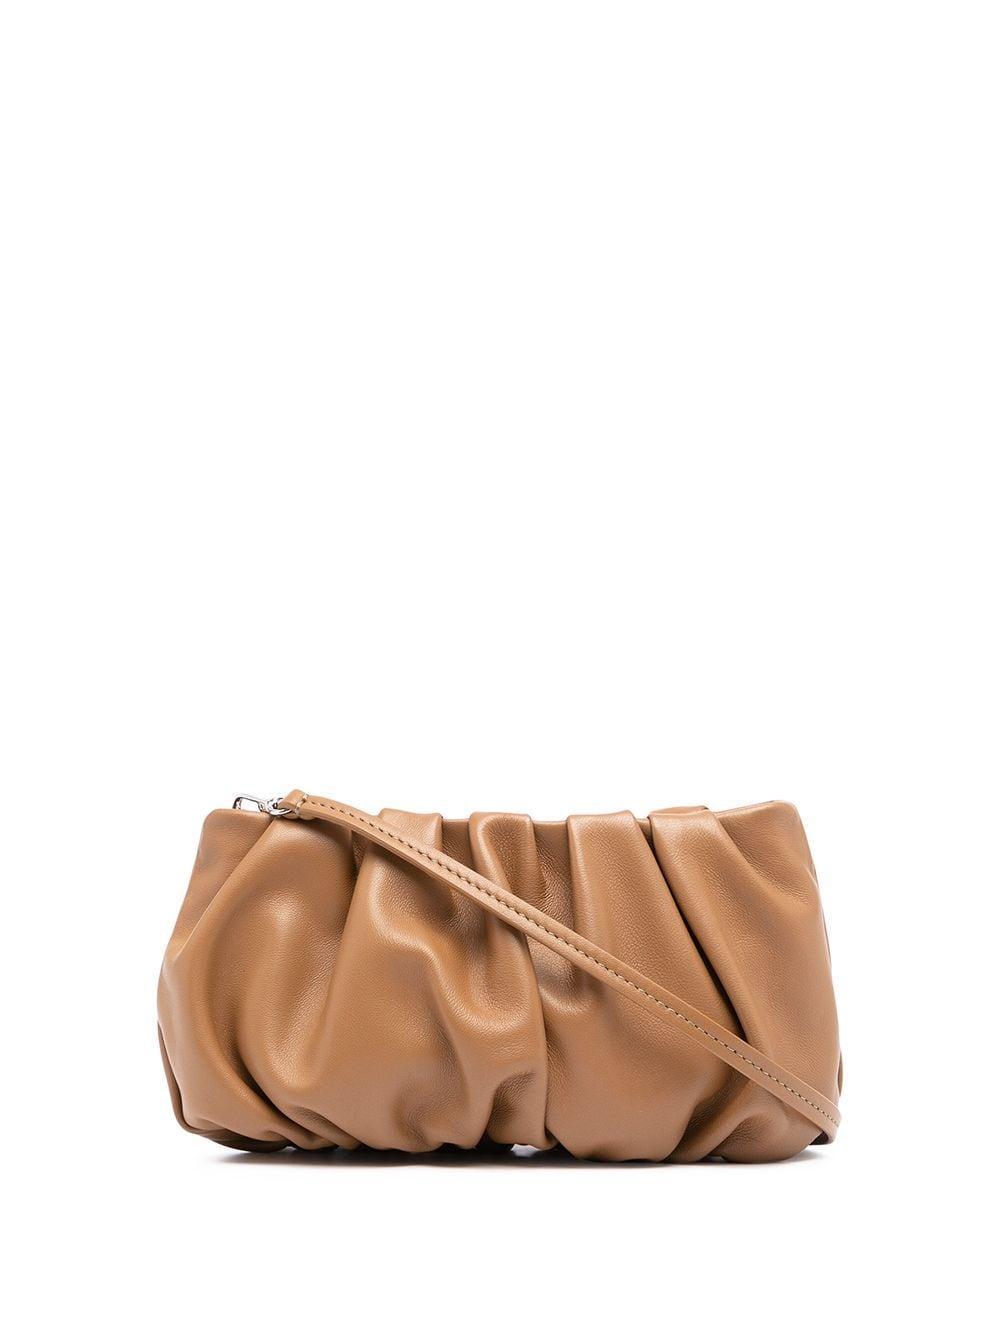 Bean Ruched Bag